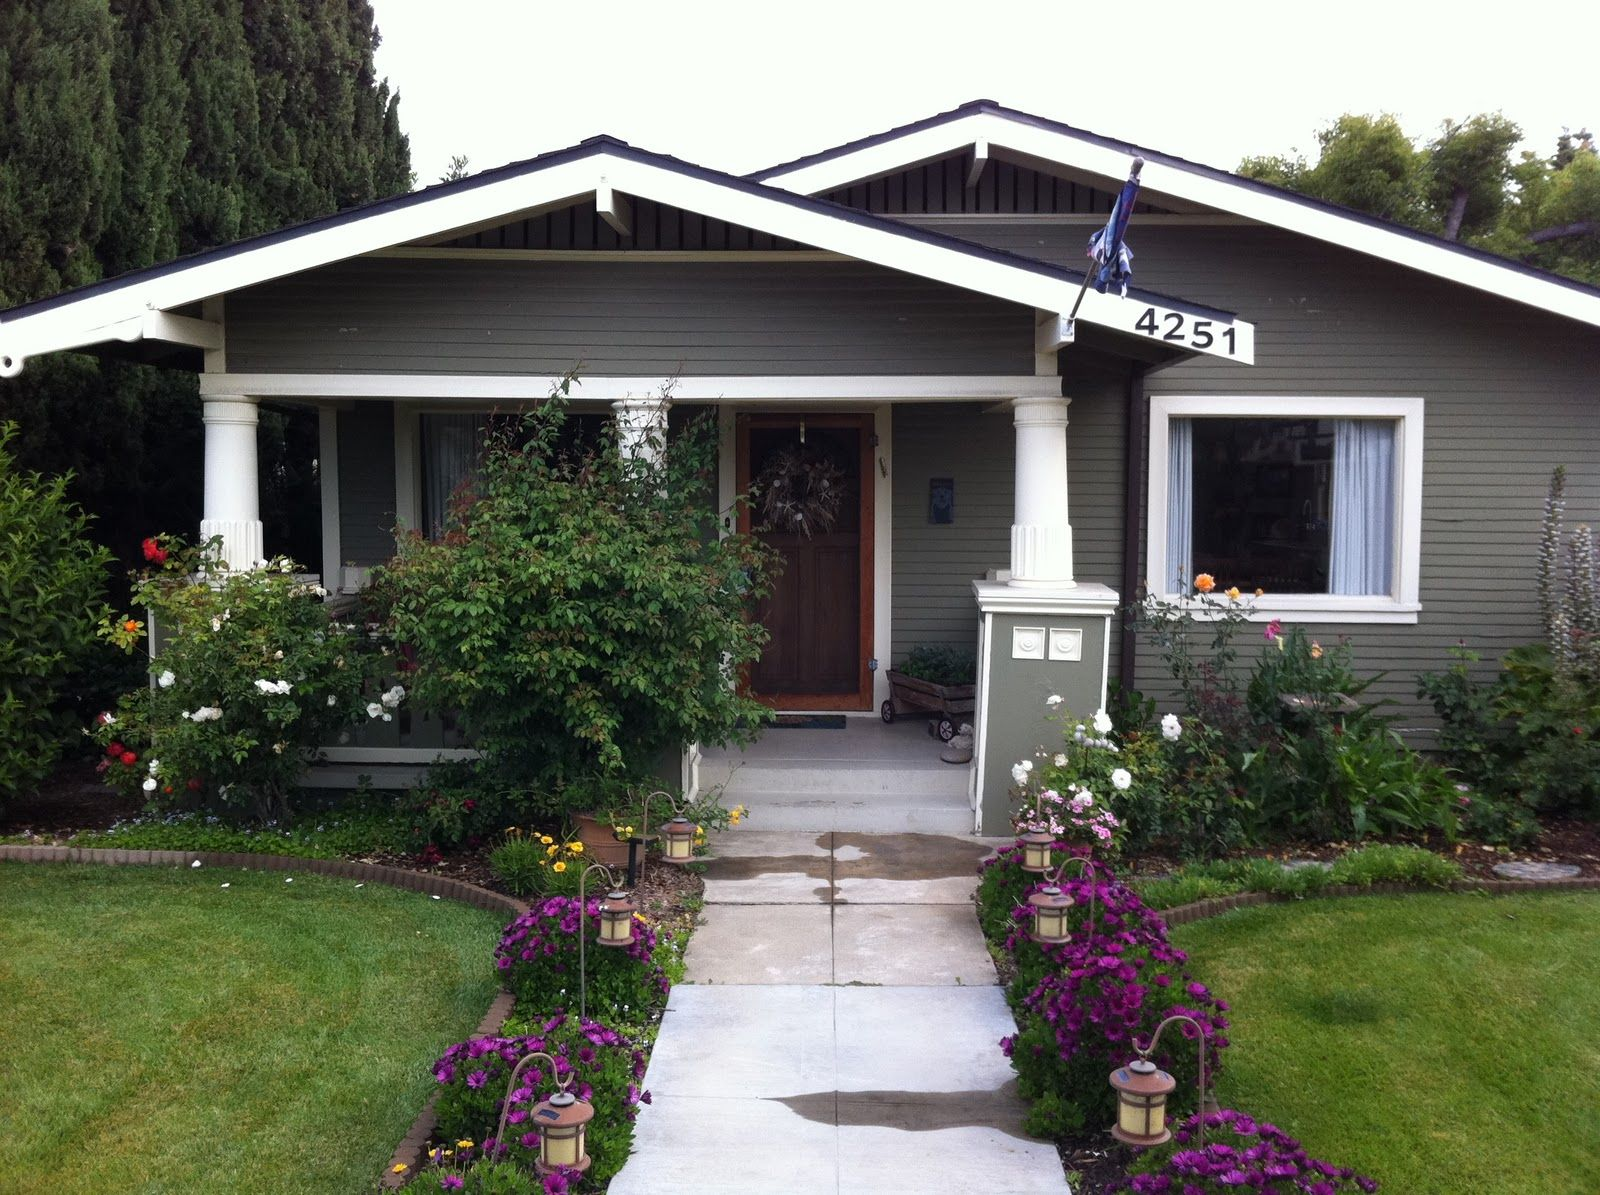 Admirable 1920S Craftsman Bungalow Craftsman Bungalow Front Porch Largest Home Design Picture Inspirations Pitcheantrous